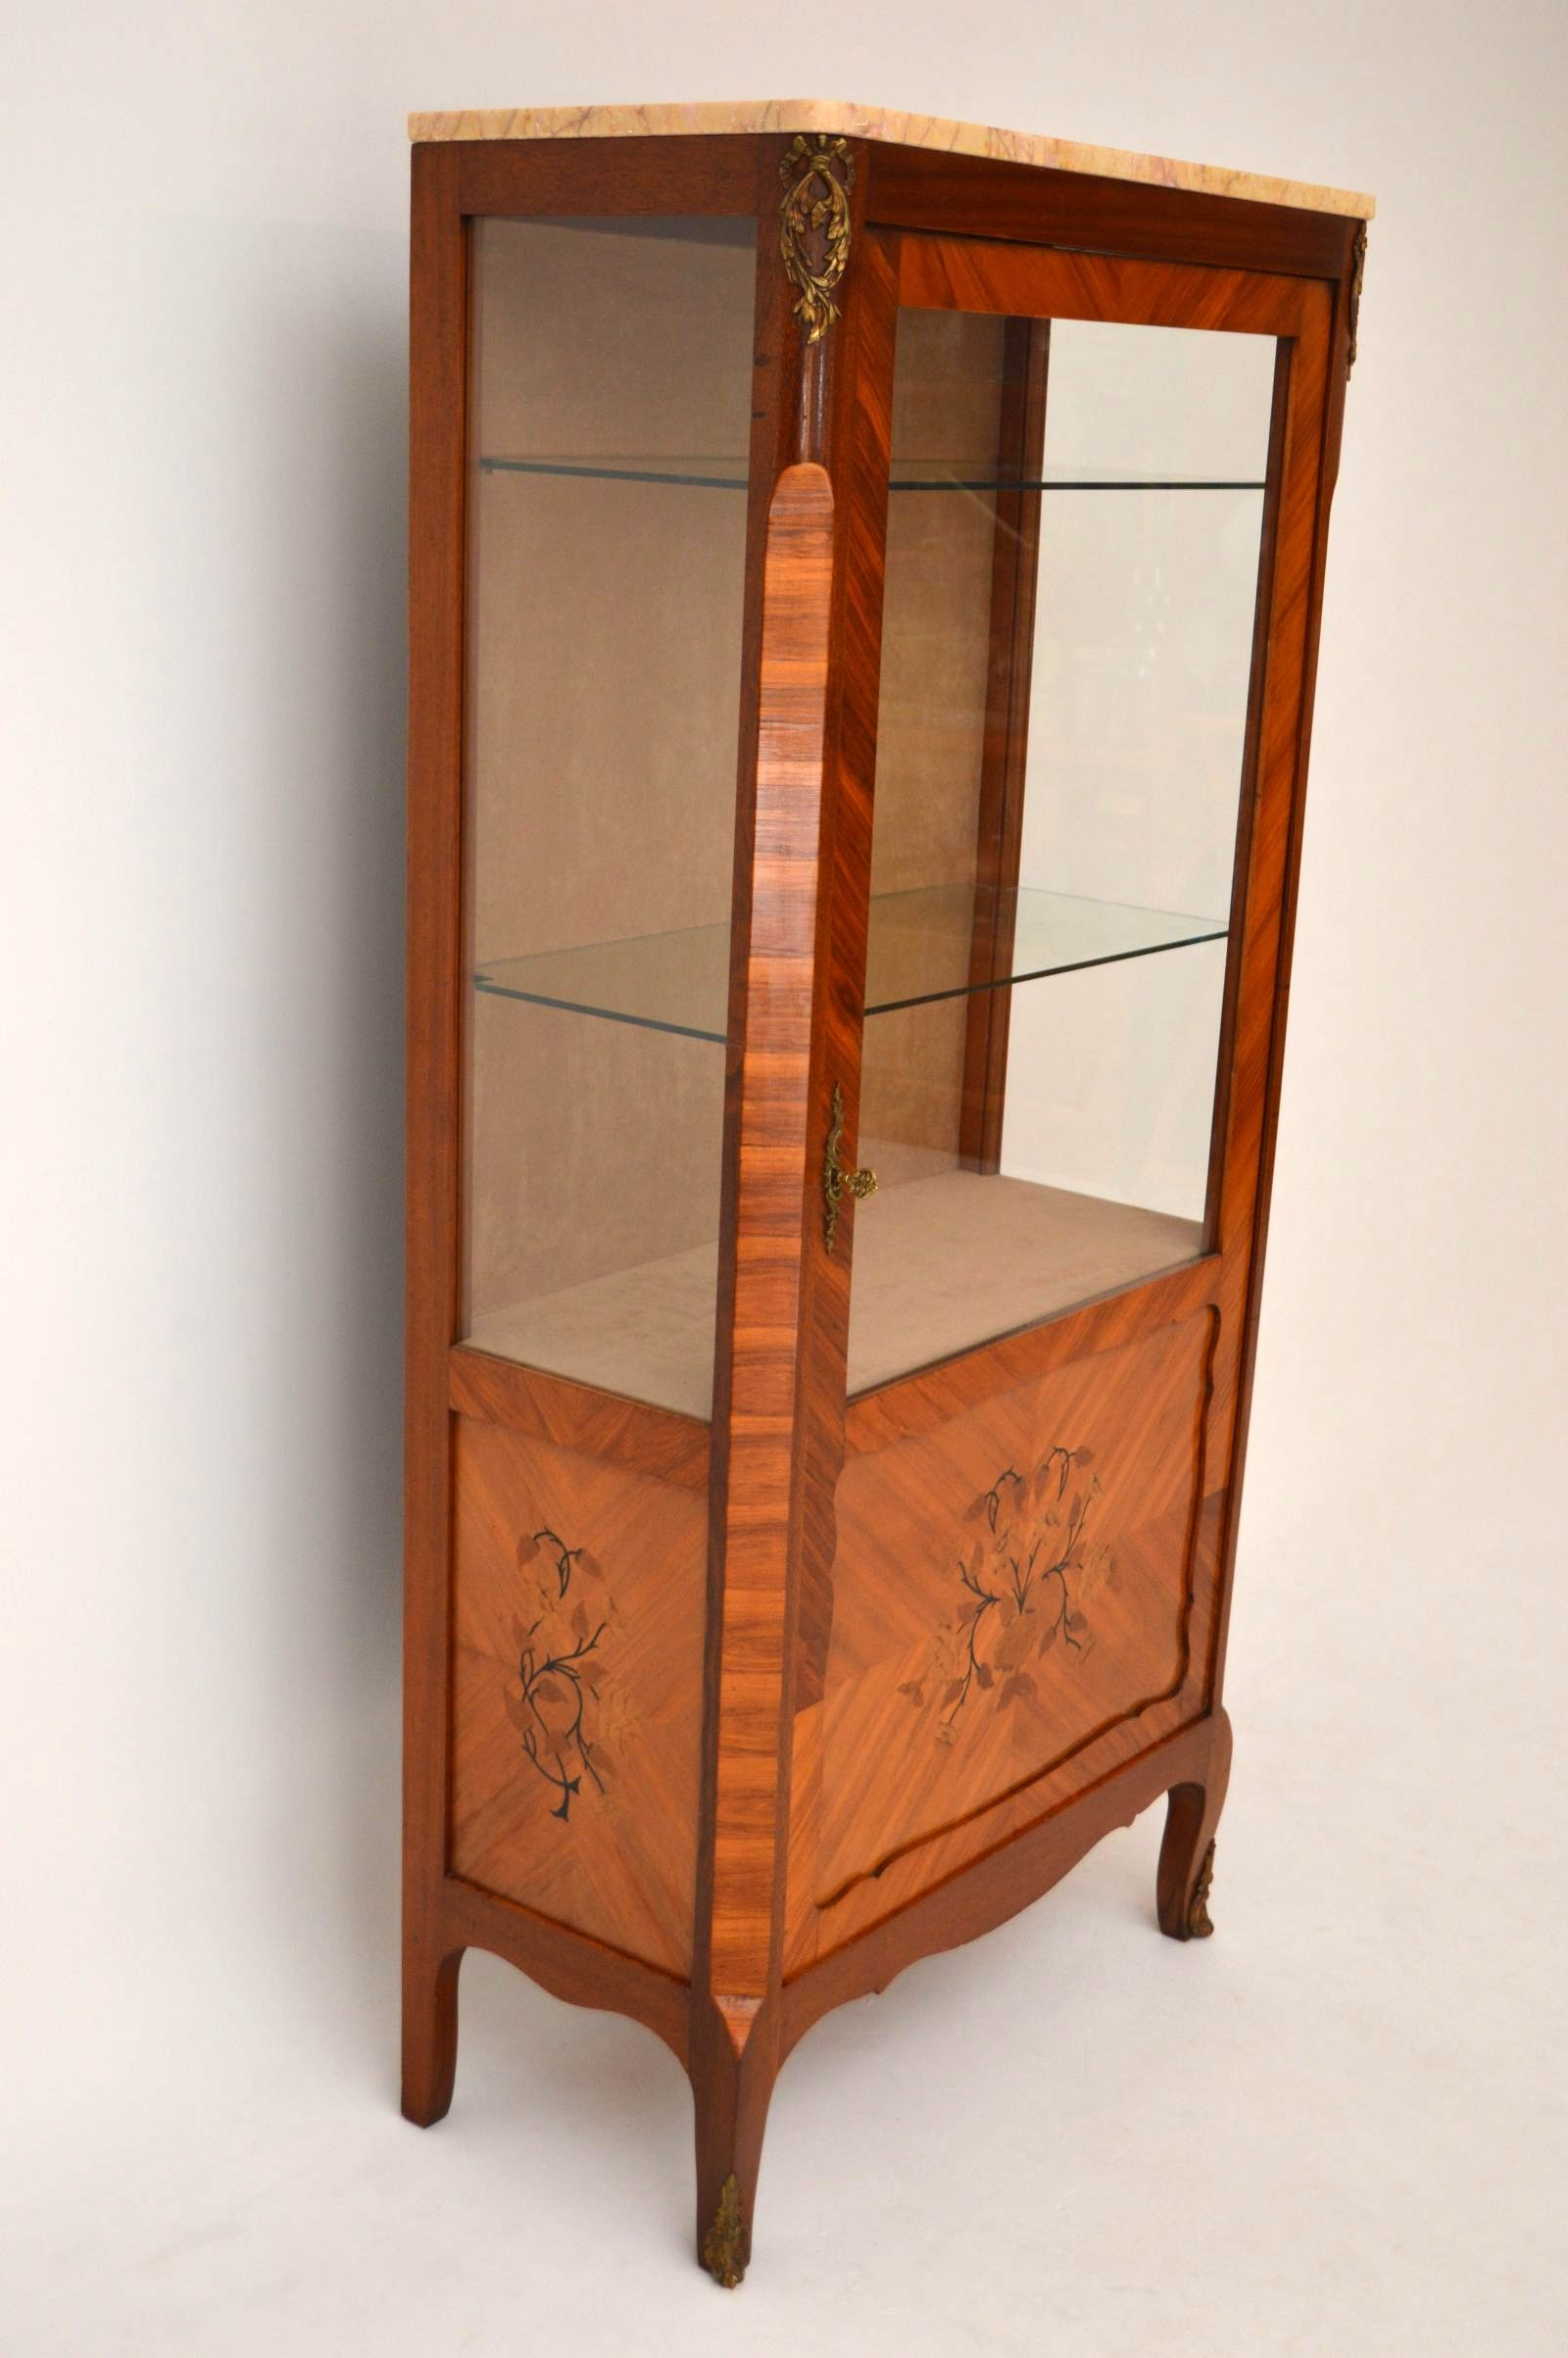 sideboard mit vitrine sideboard mit vitrine von broyhill brasilia 1960er bei pamono kaufen. Black Bedroom Furniture Sets. Home Design Ideas